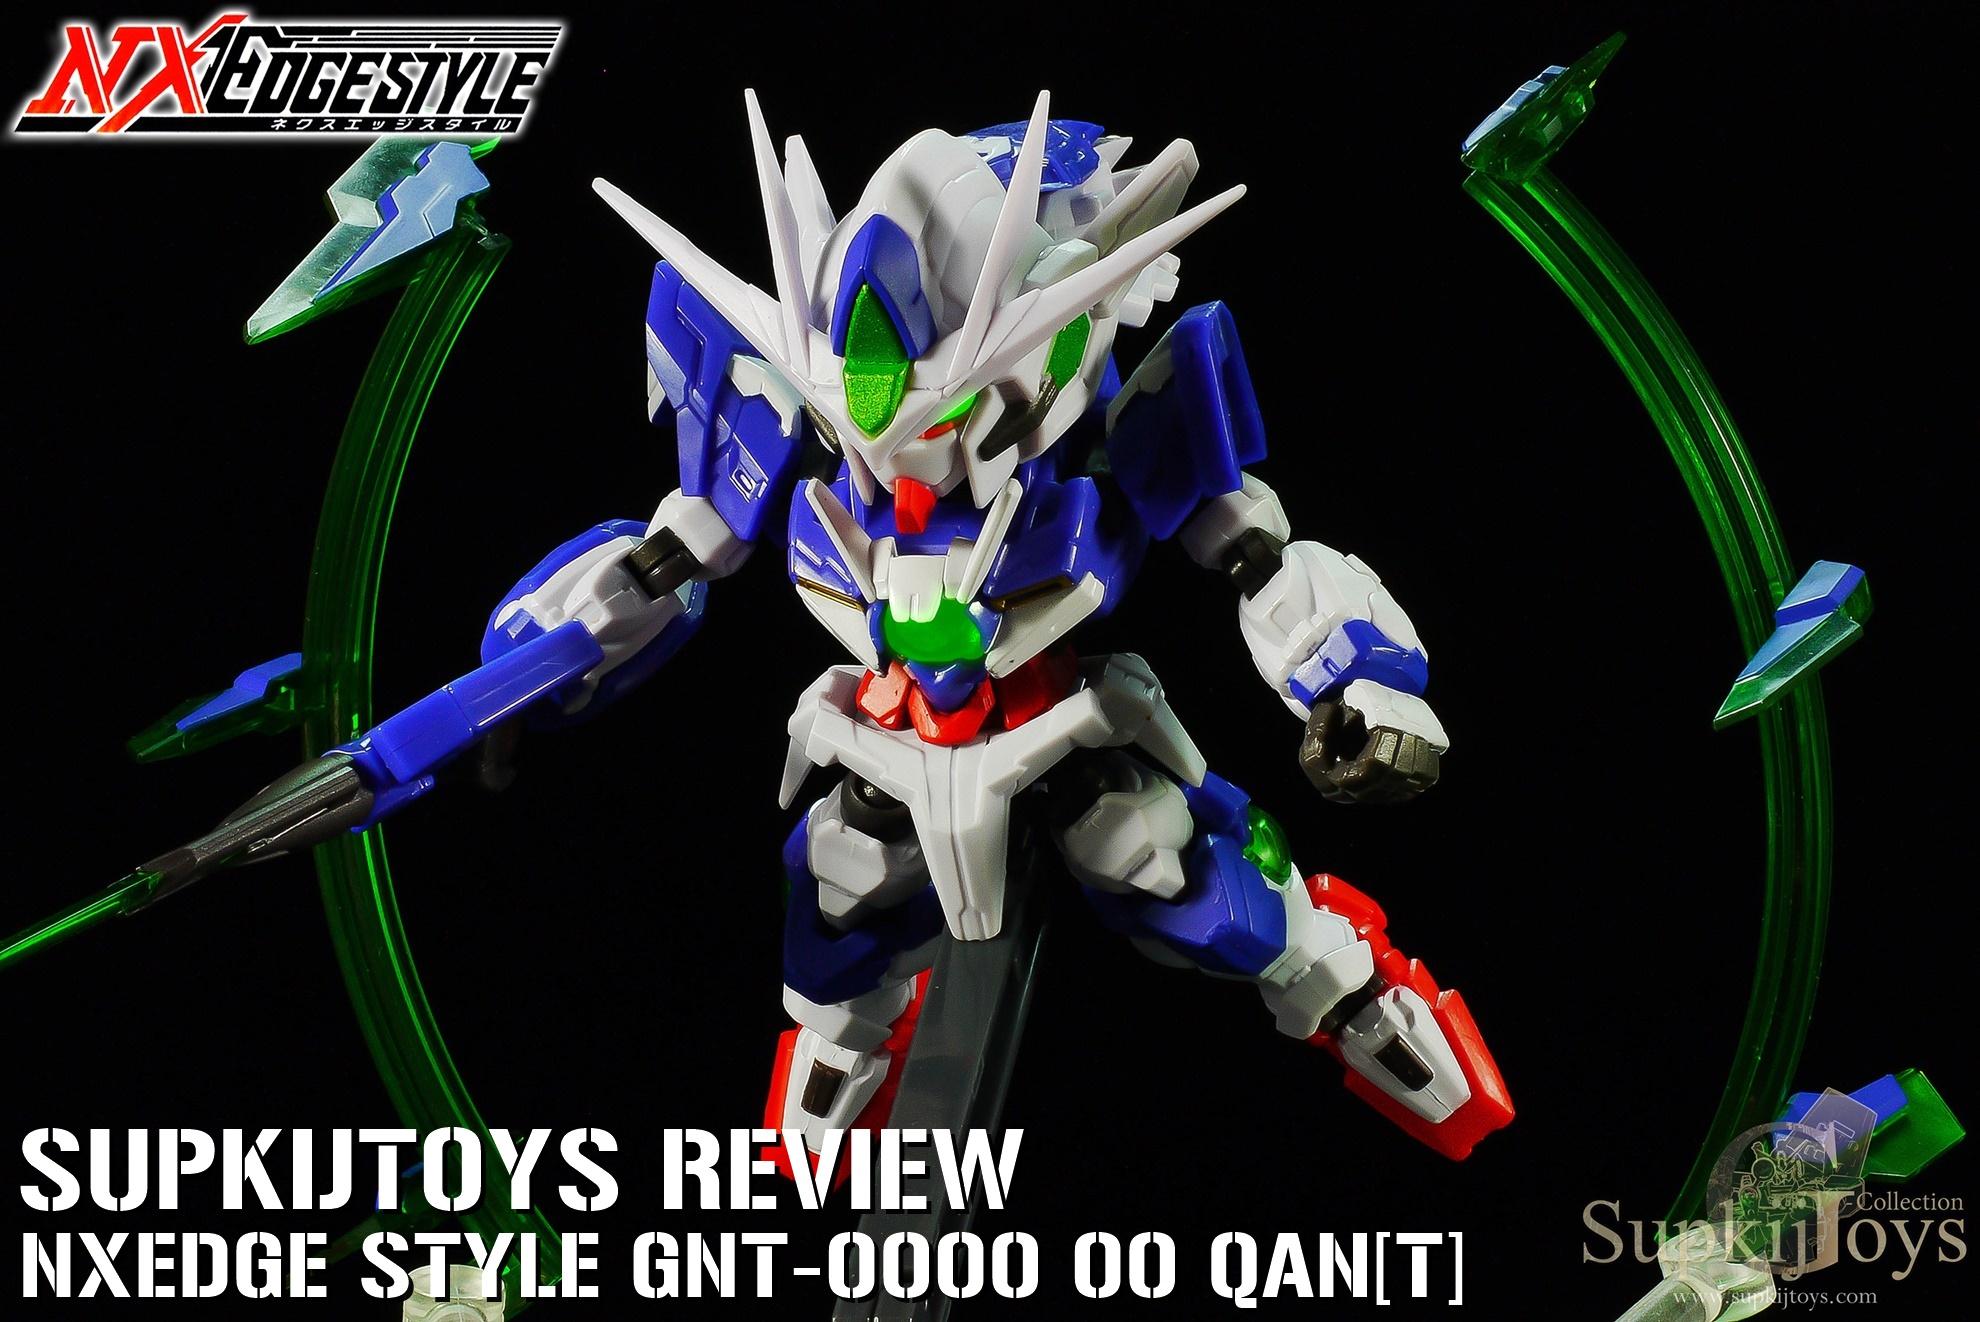 Nxedge Style NX-0009 GNT-0000 00 Qan[T]